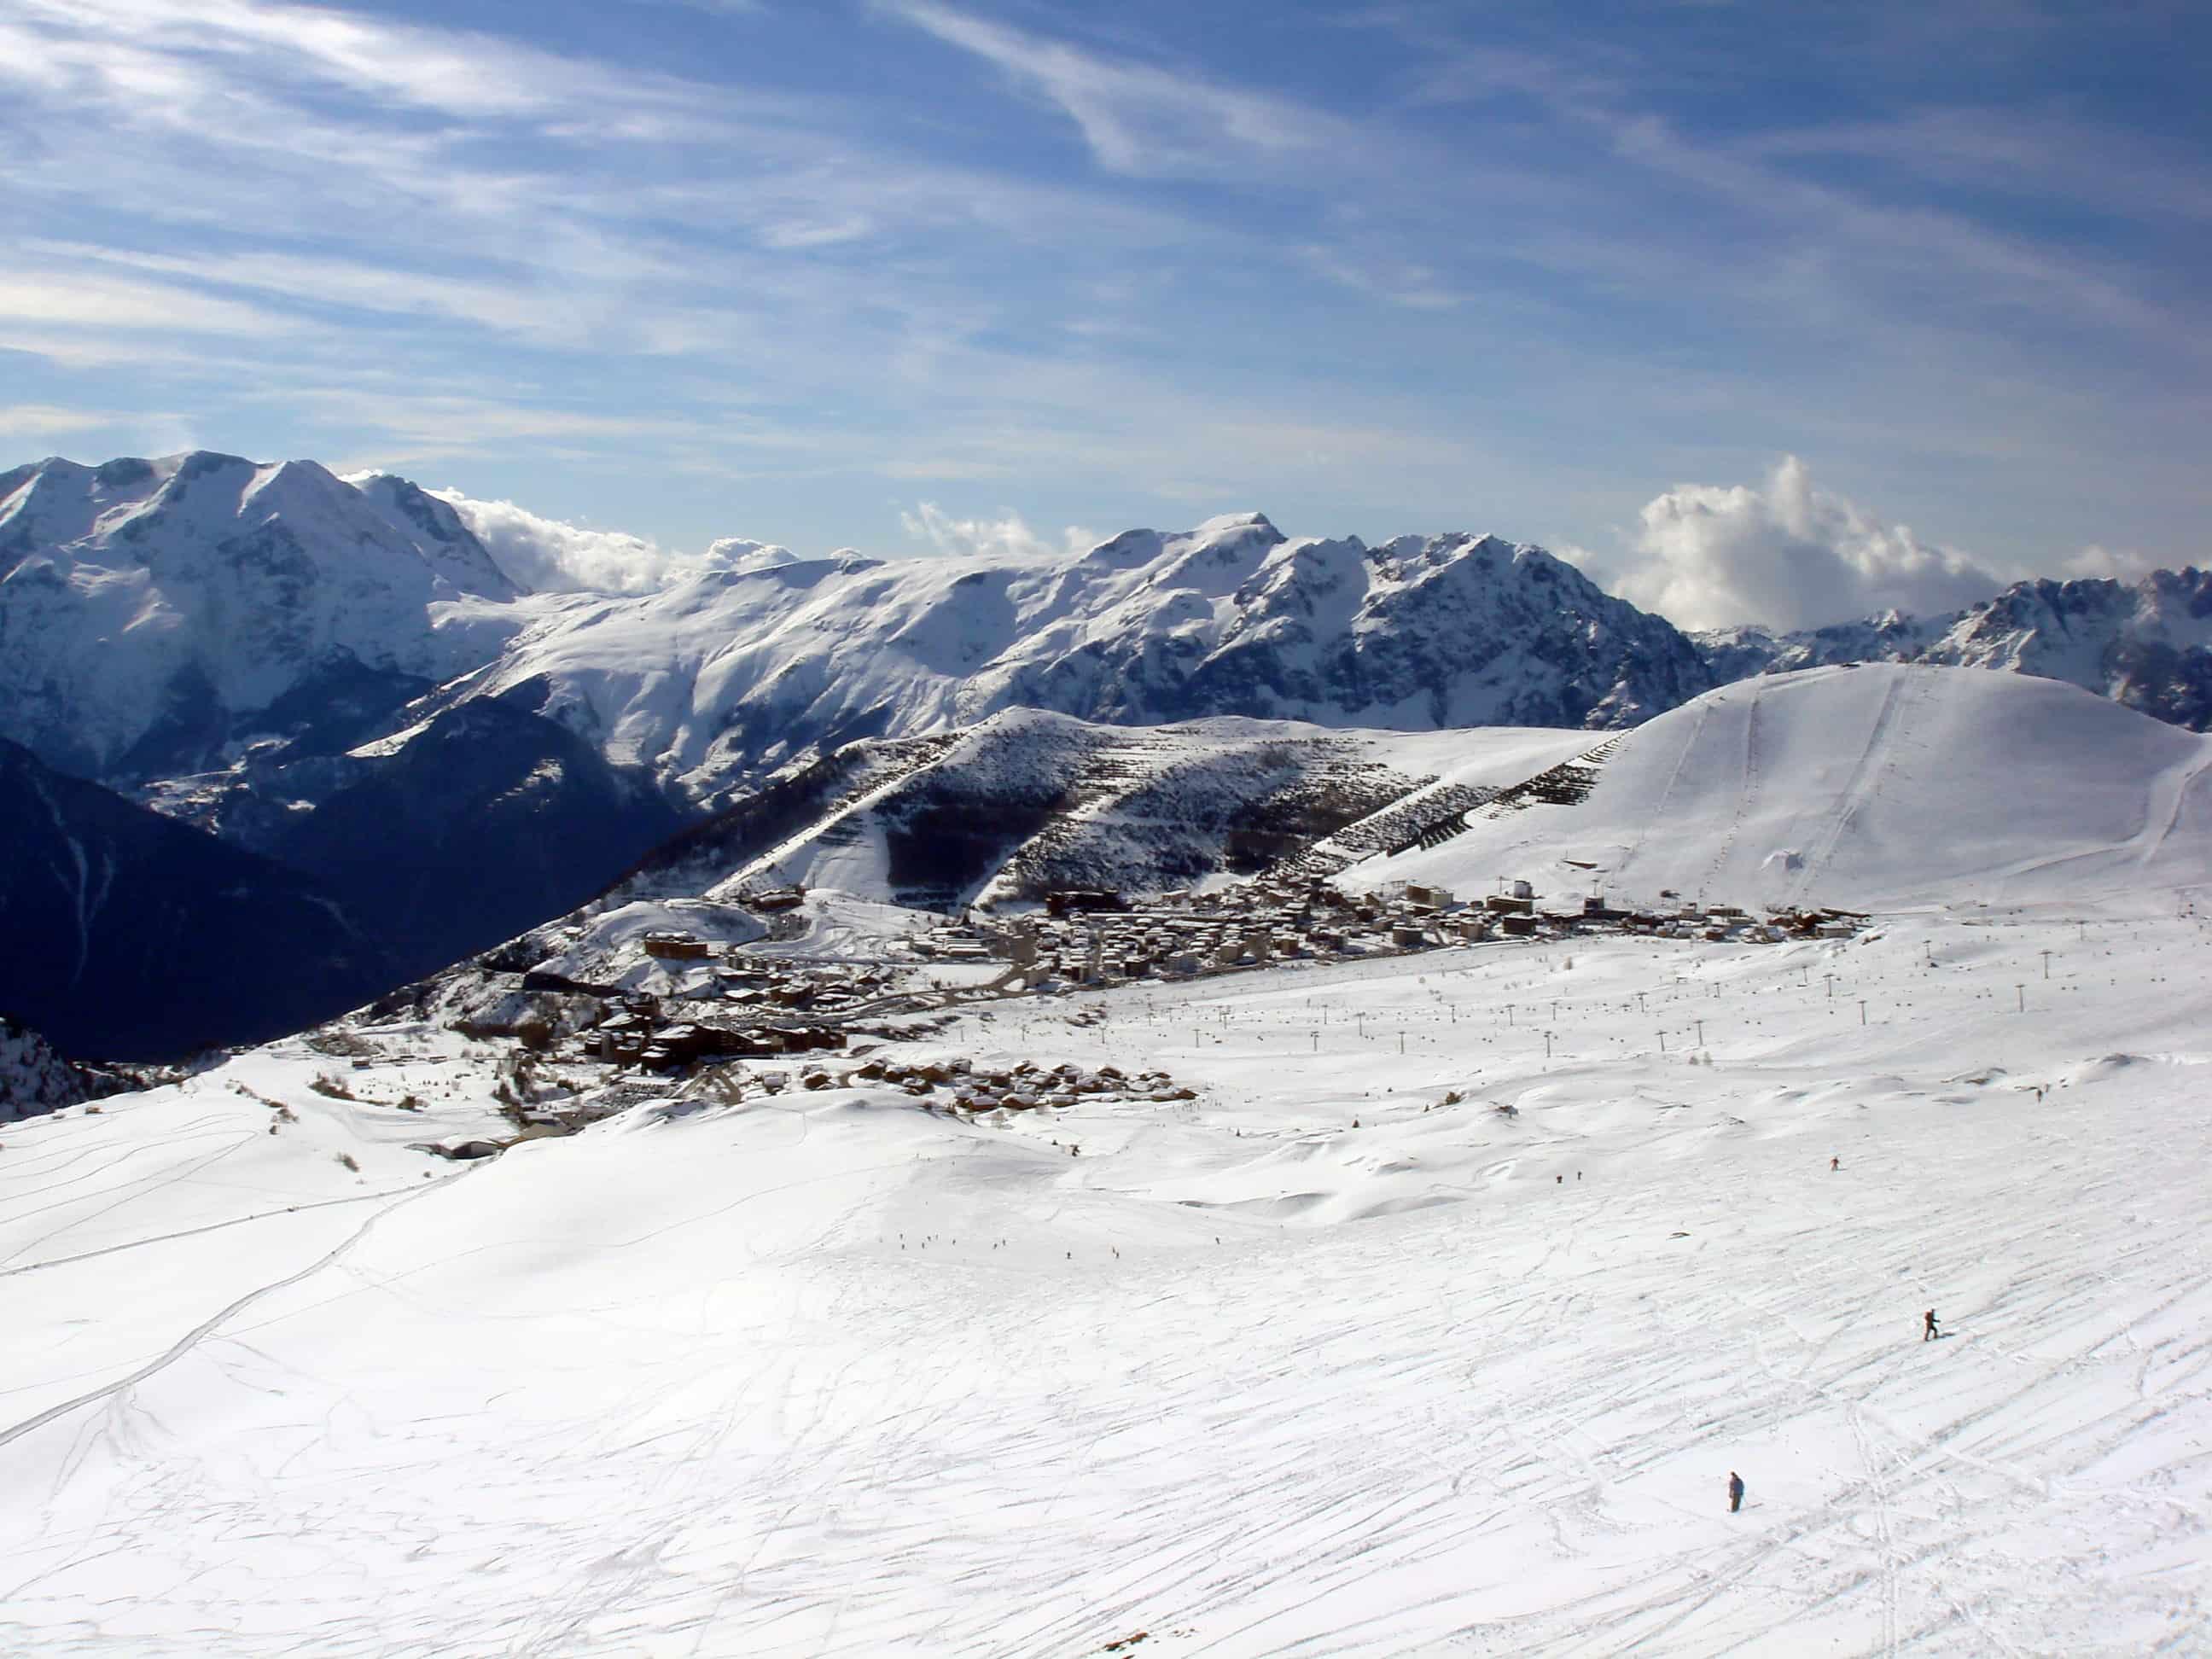 Alpe d'Huez ski resort from above